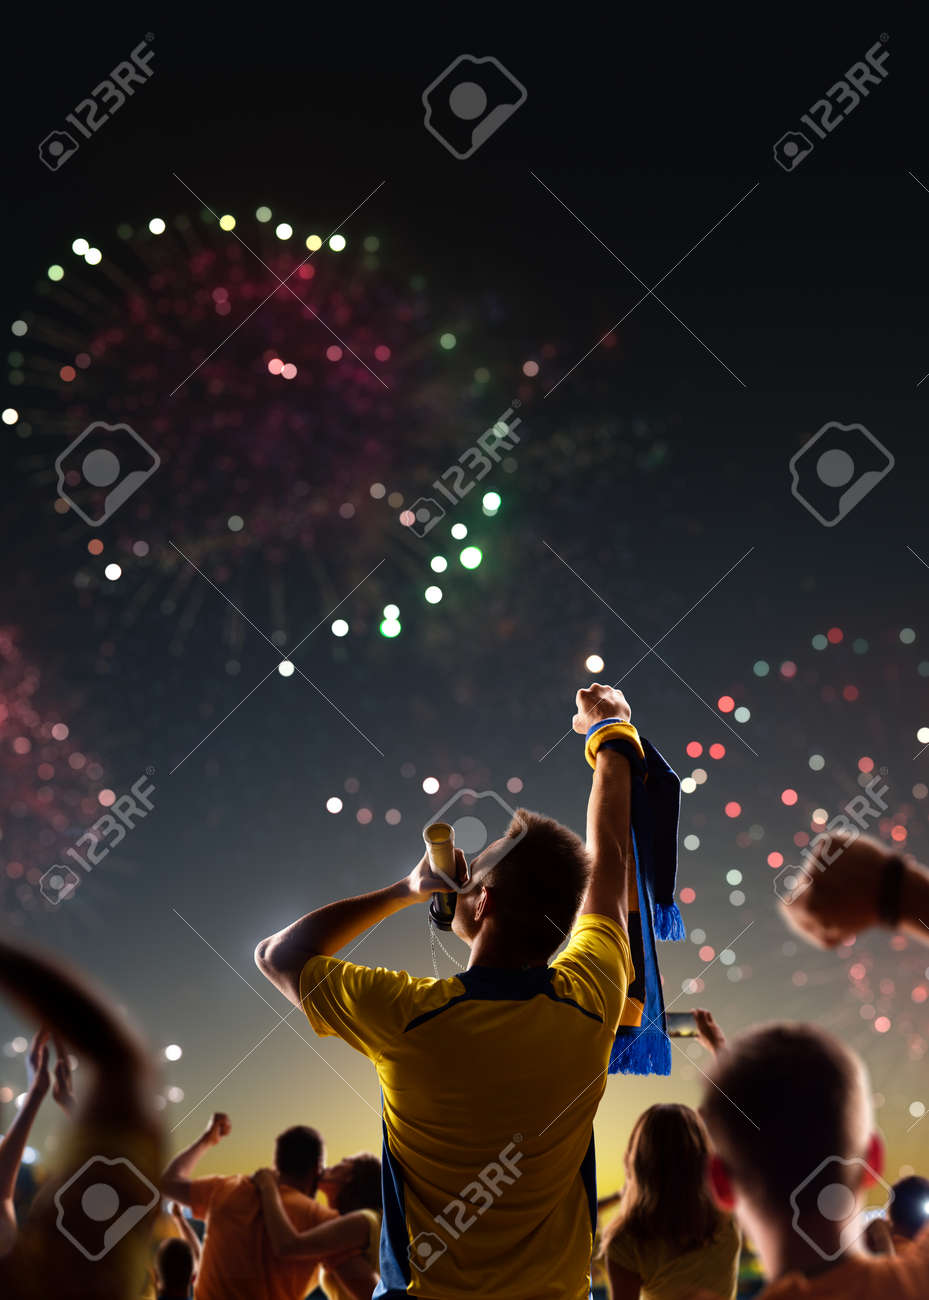 Fans celebrate in Stadium Arena night fireworks - 157252687